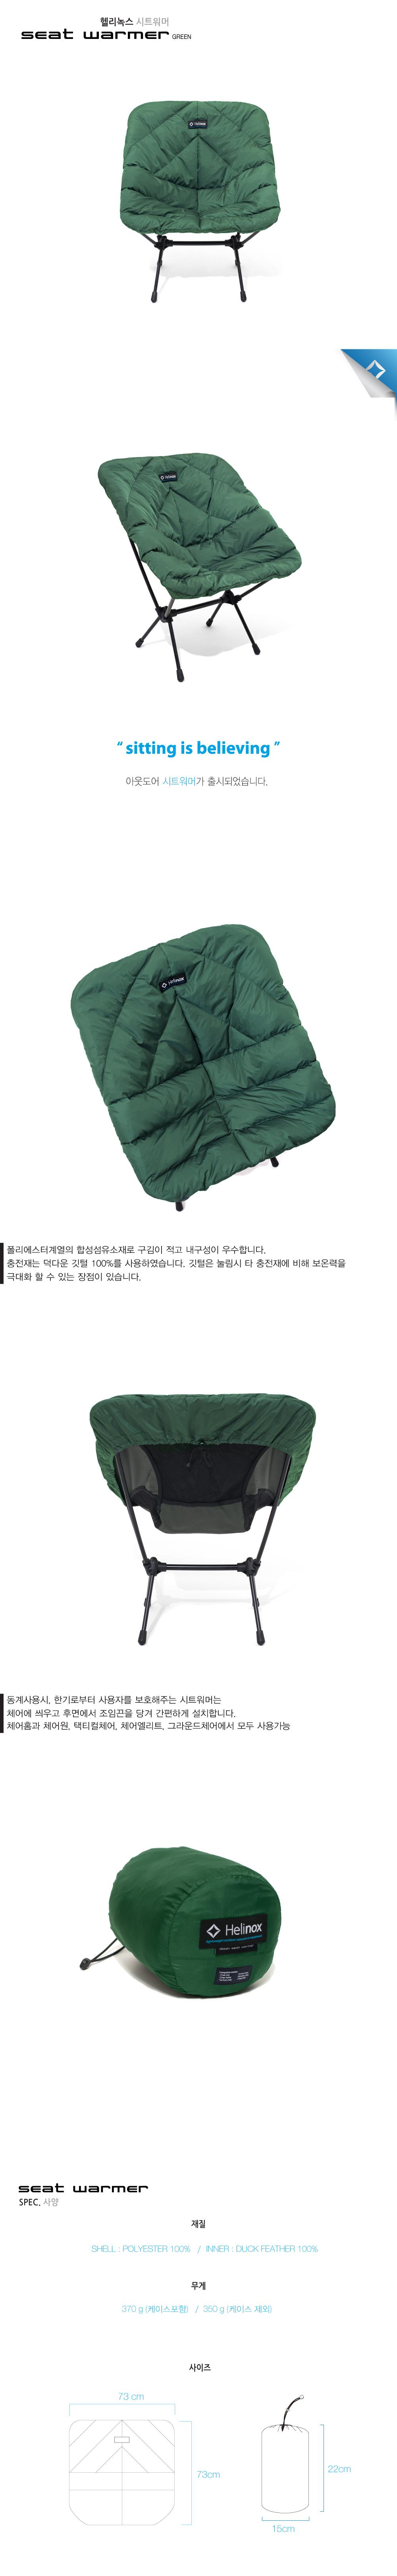 20151207-Seatwarmer_green상품페이지.jpg